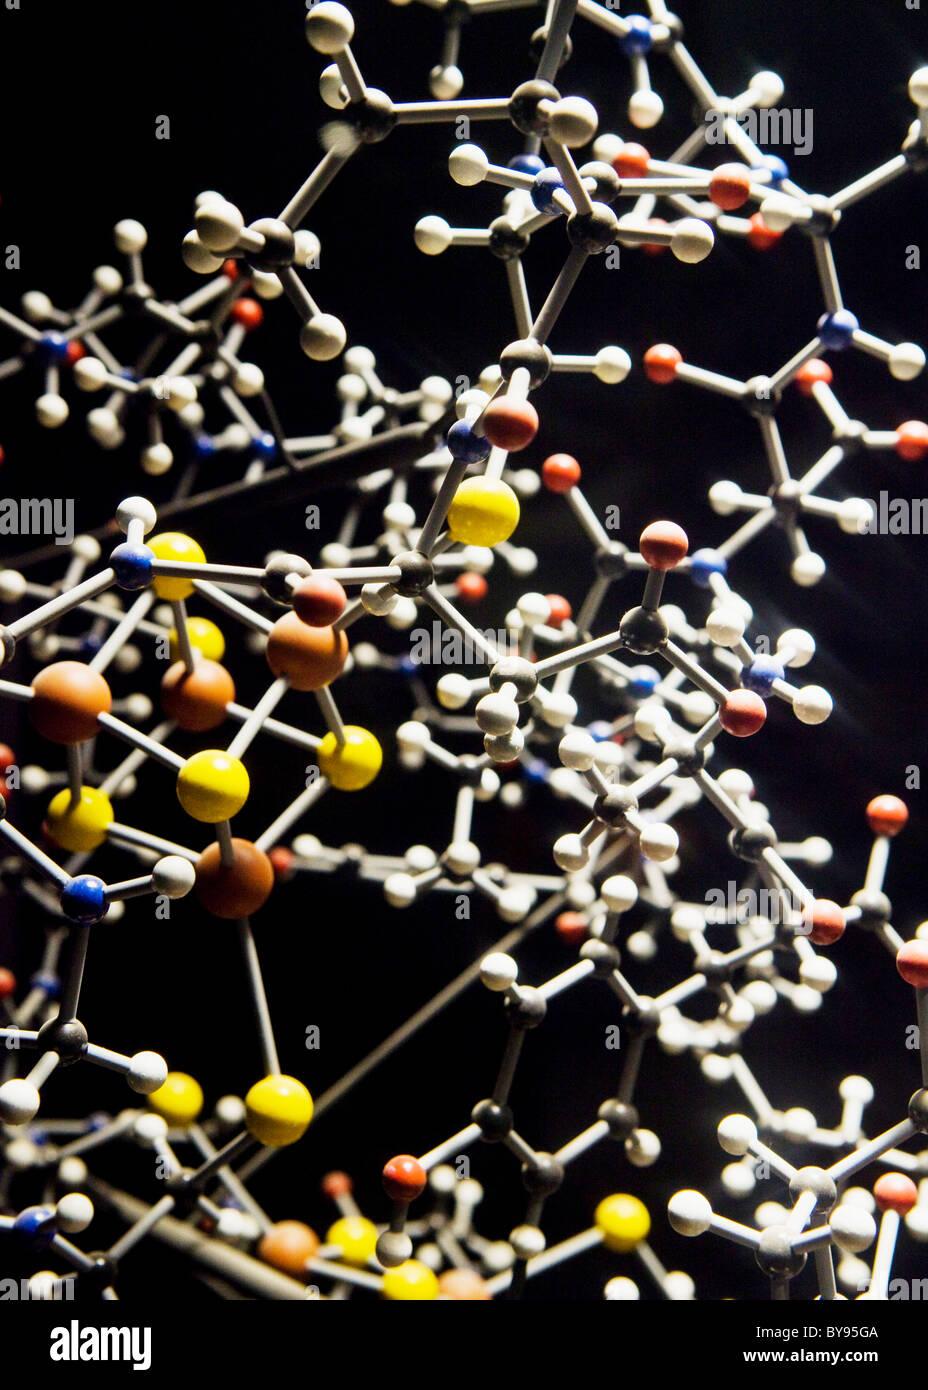 Protein molecule model - Stock Image